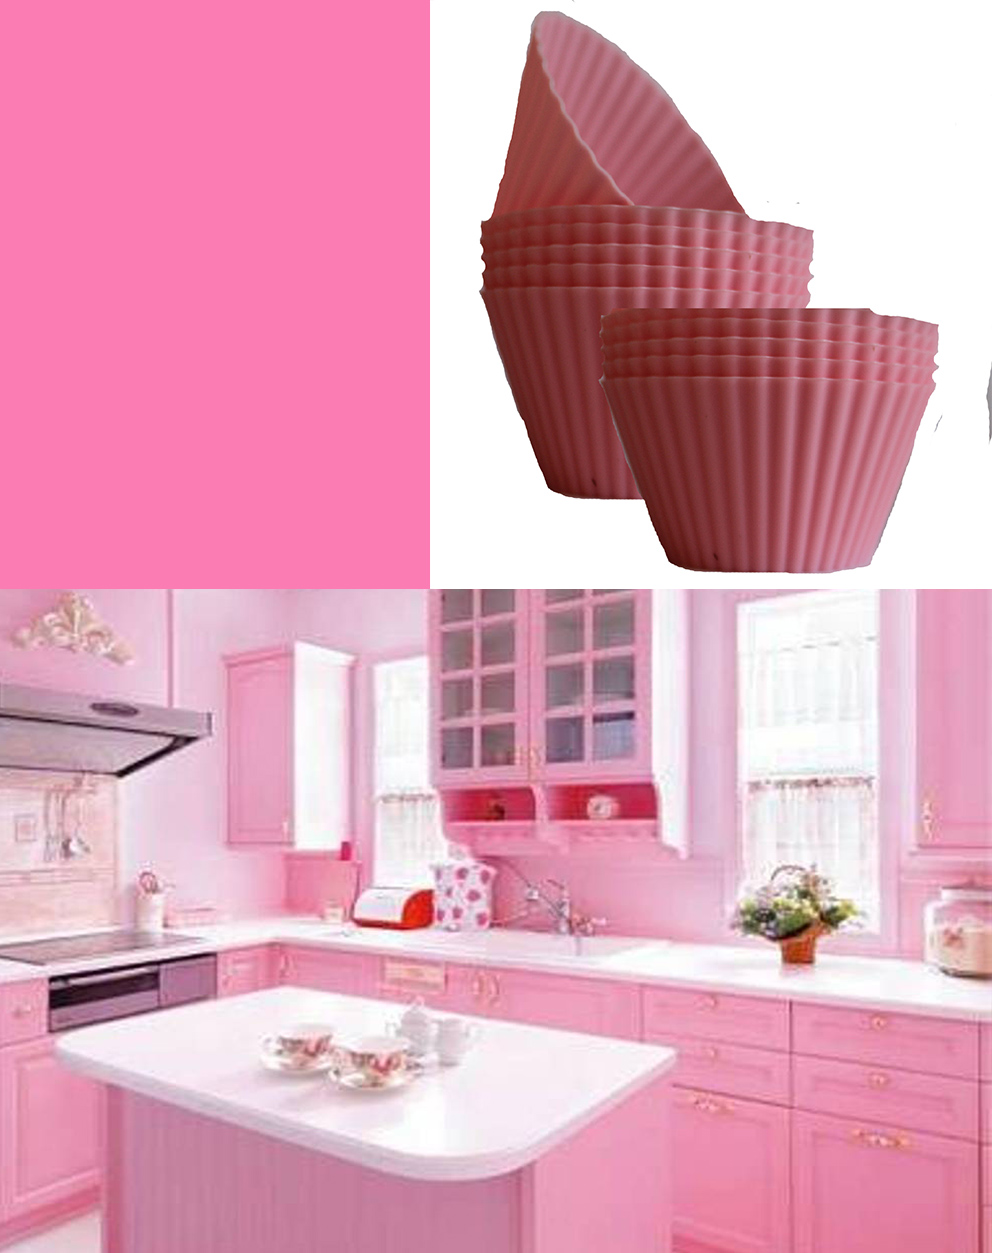 BG-POW-cupcake-cups-Pink-Kitchen.jpg